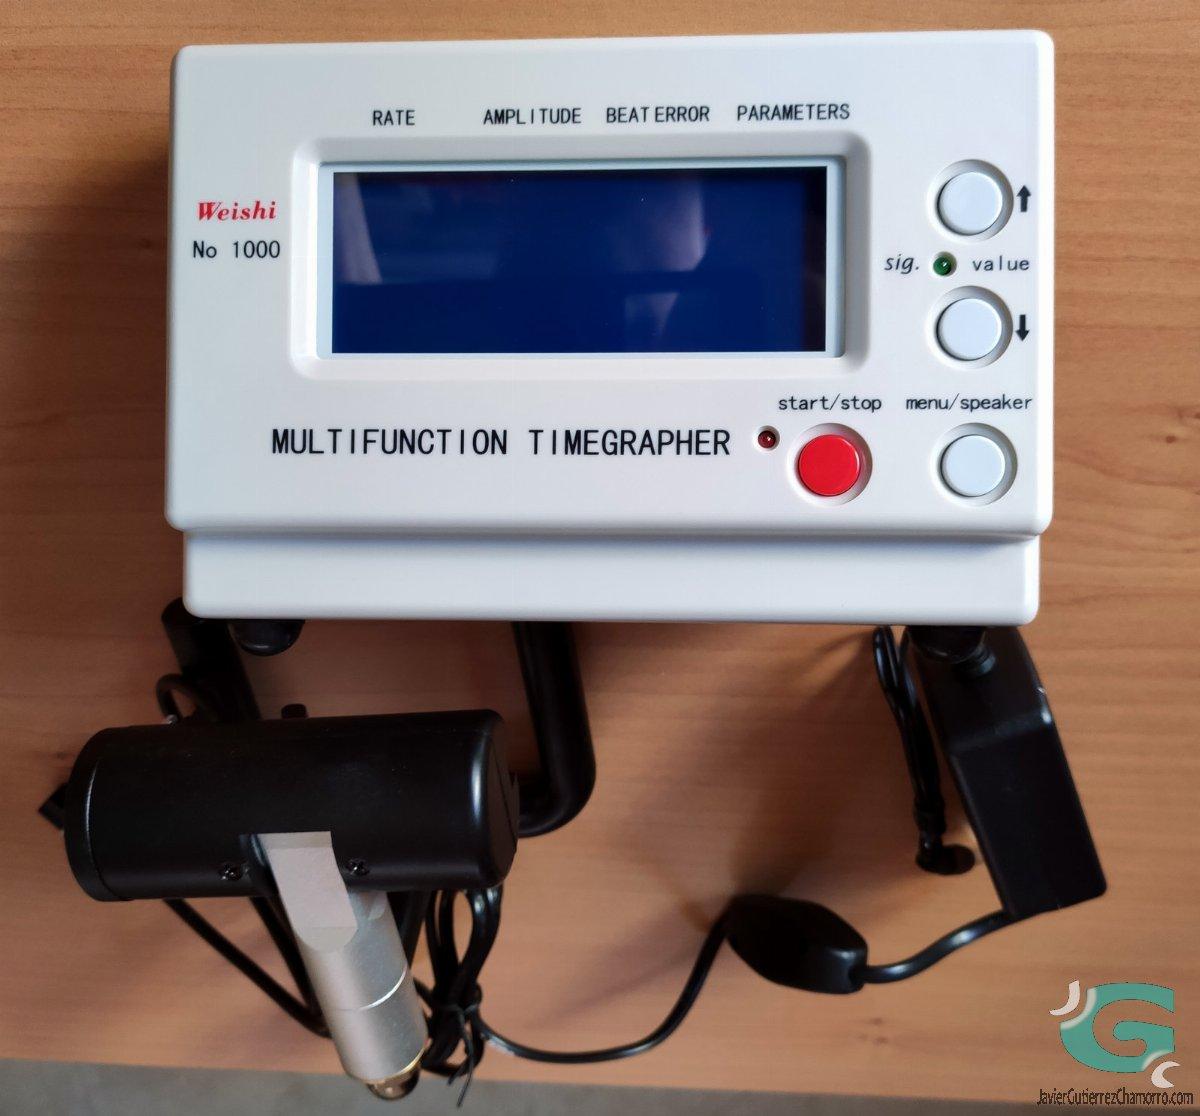 Weishi timegrapher NO 1000 / MTG1000